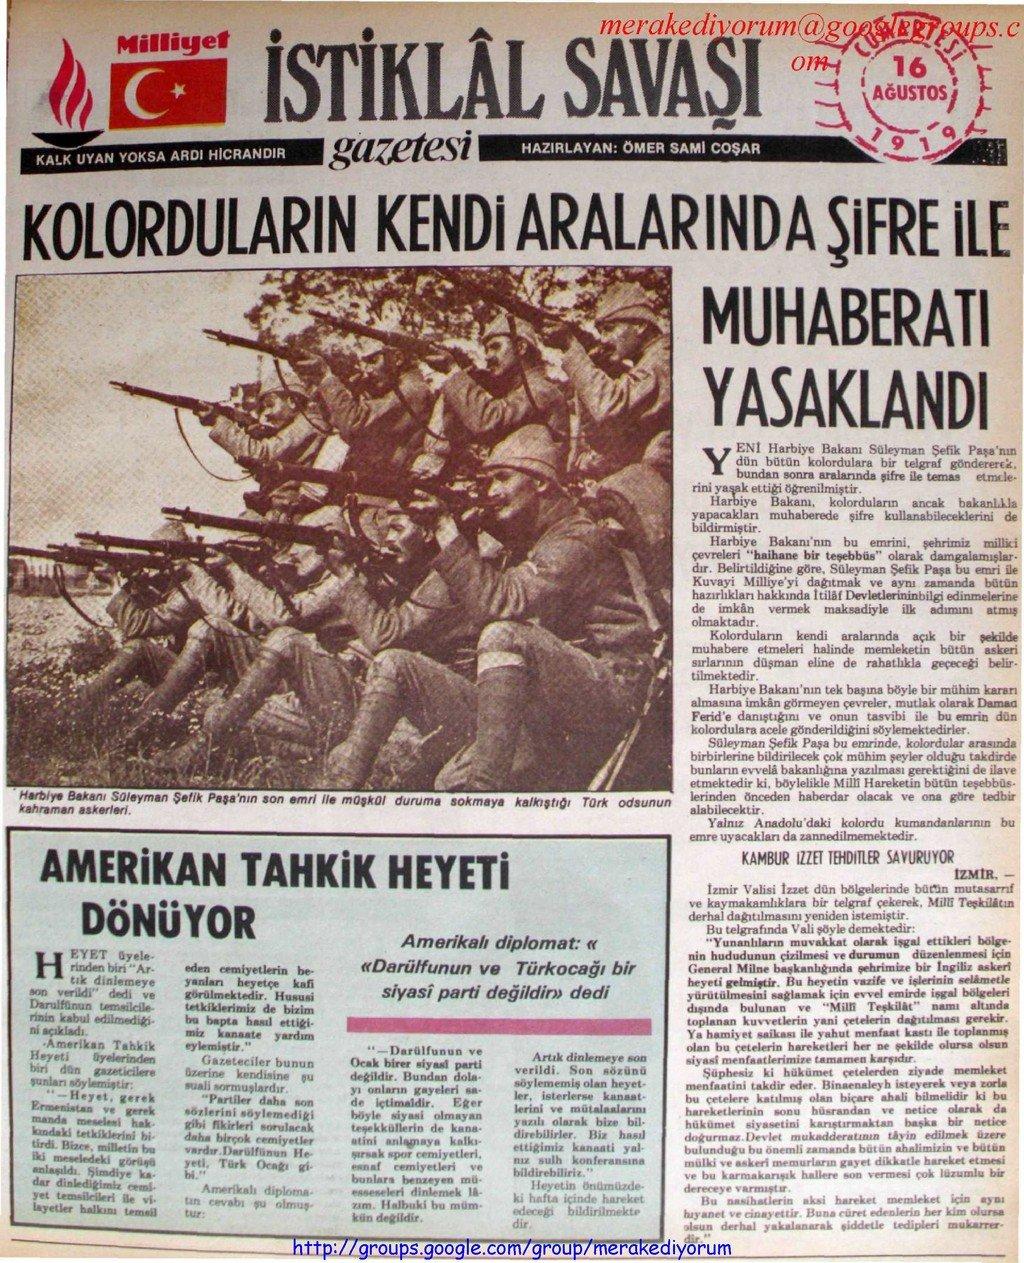 istiklal savaşı gazetesi - 16 ağustos 1919